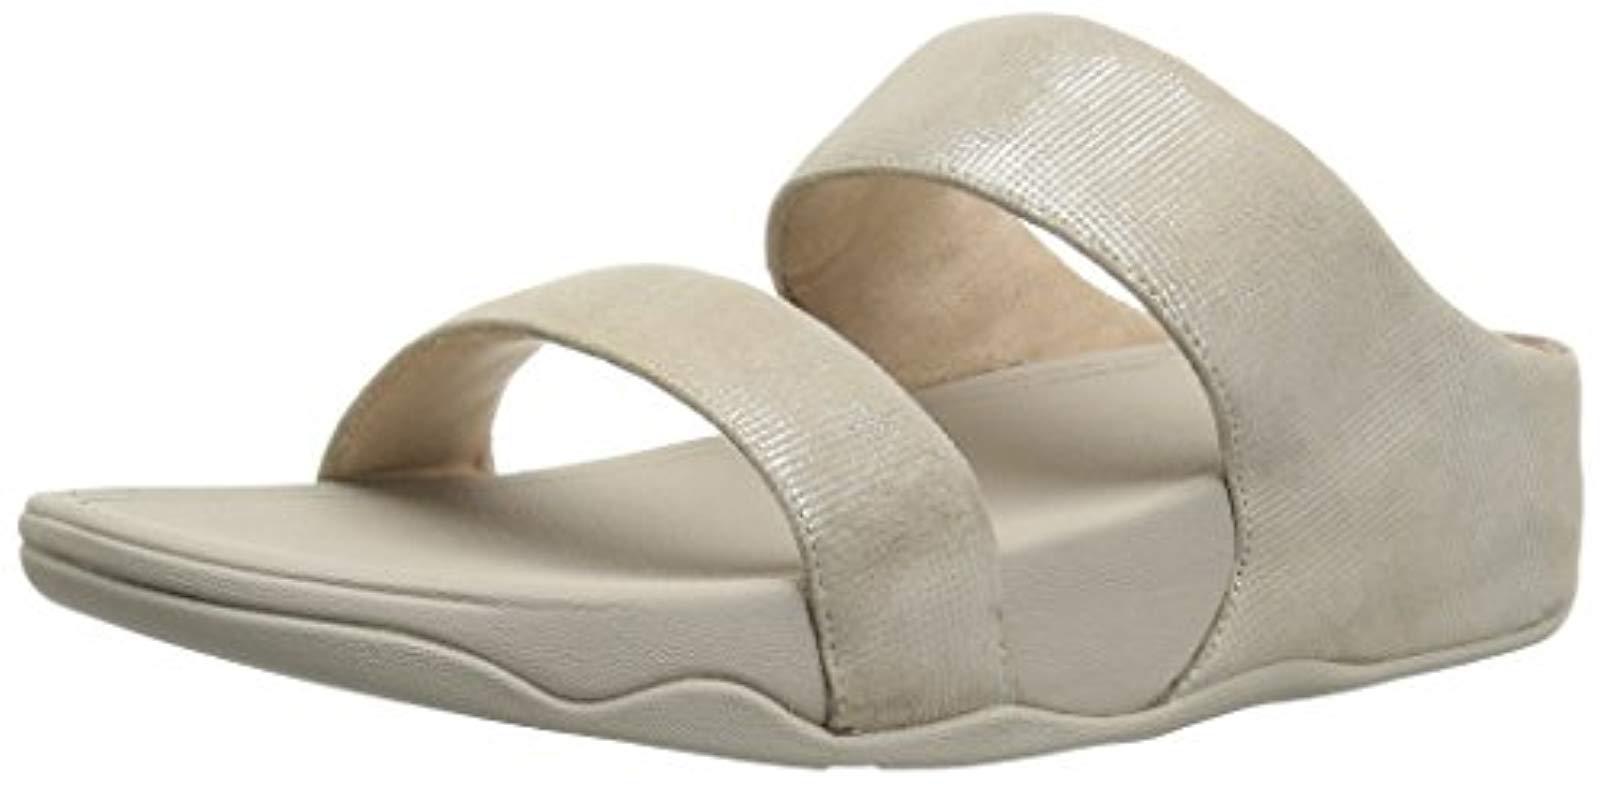 a49e91dc2 Fitflop. Women s Lulu Slide Shimmer-check Open Toe Sandals